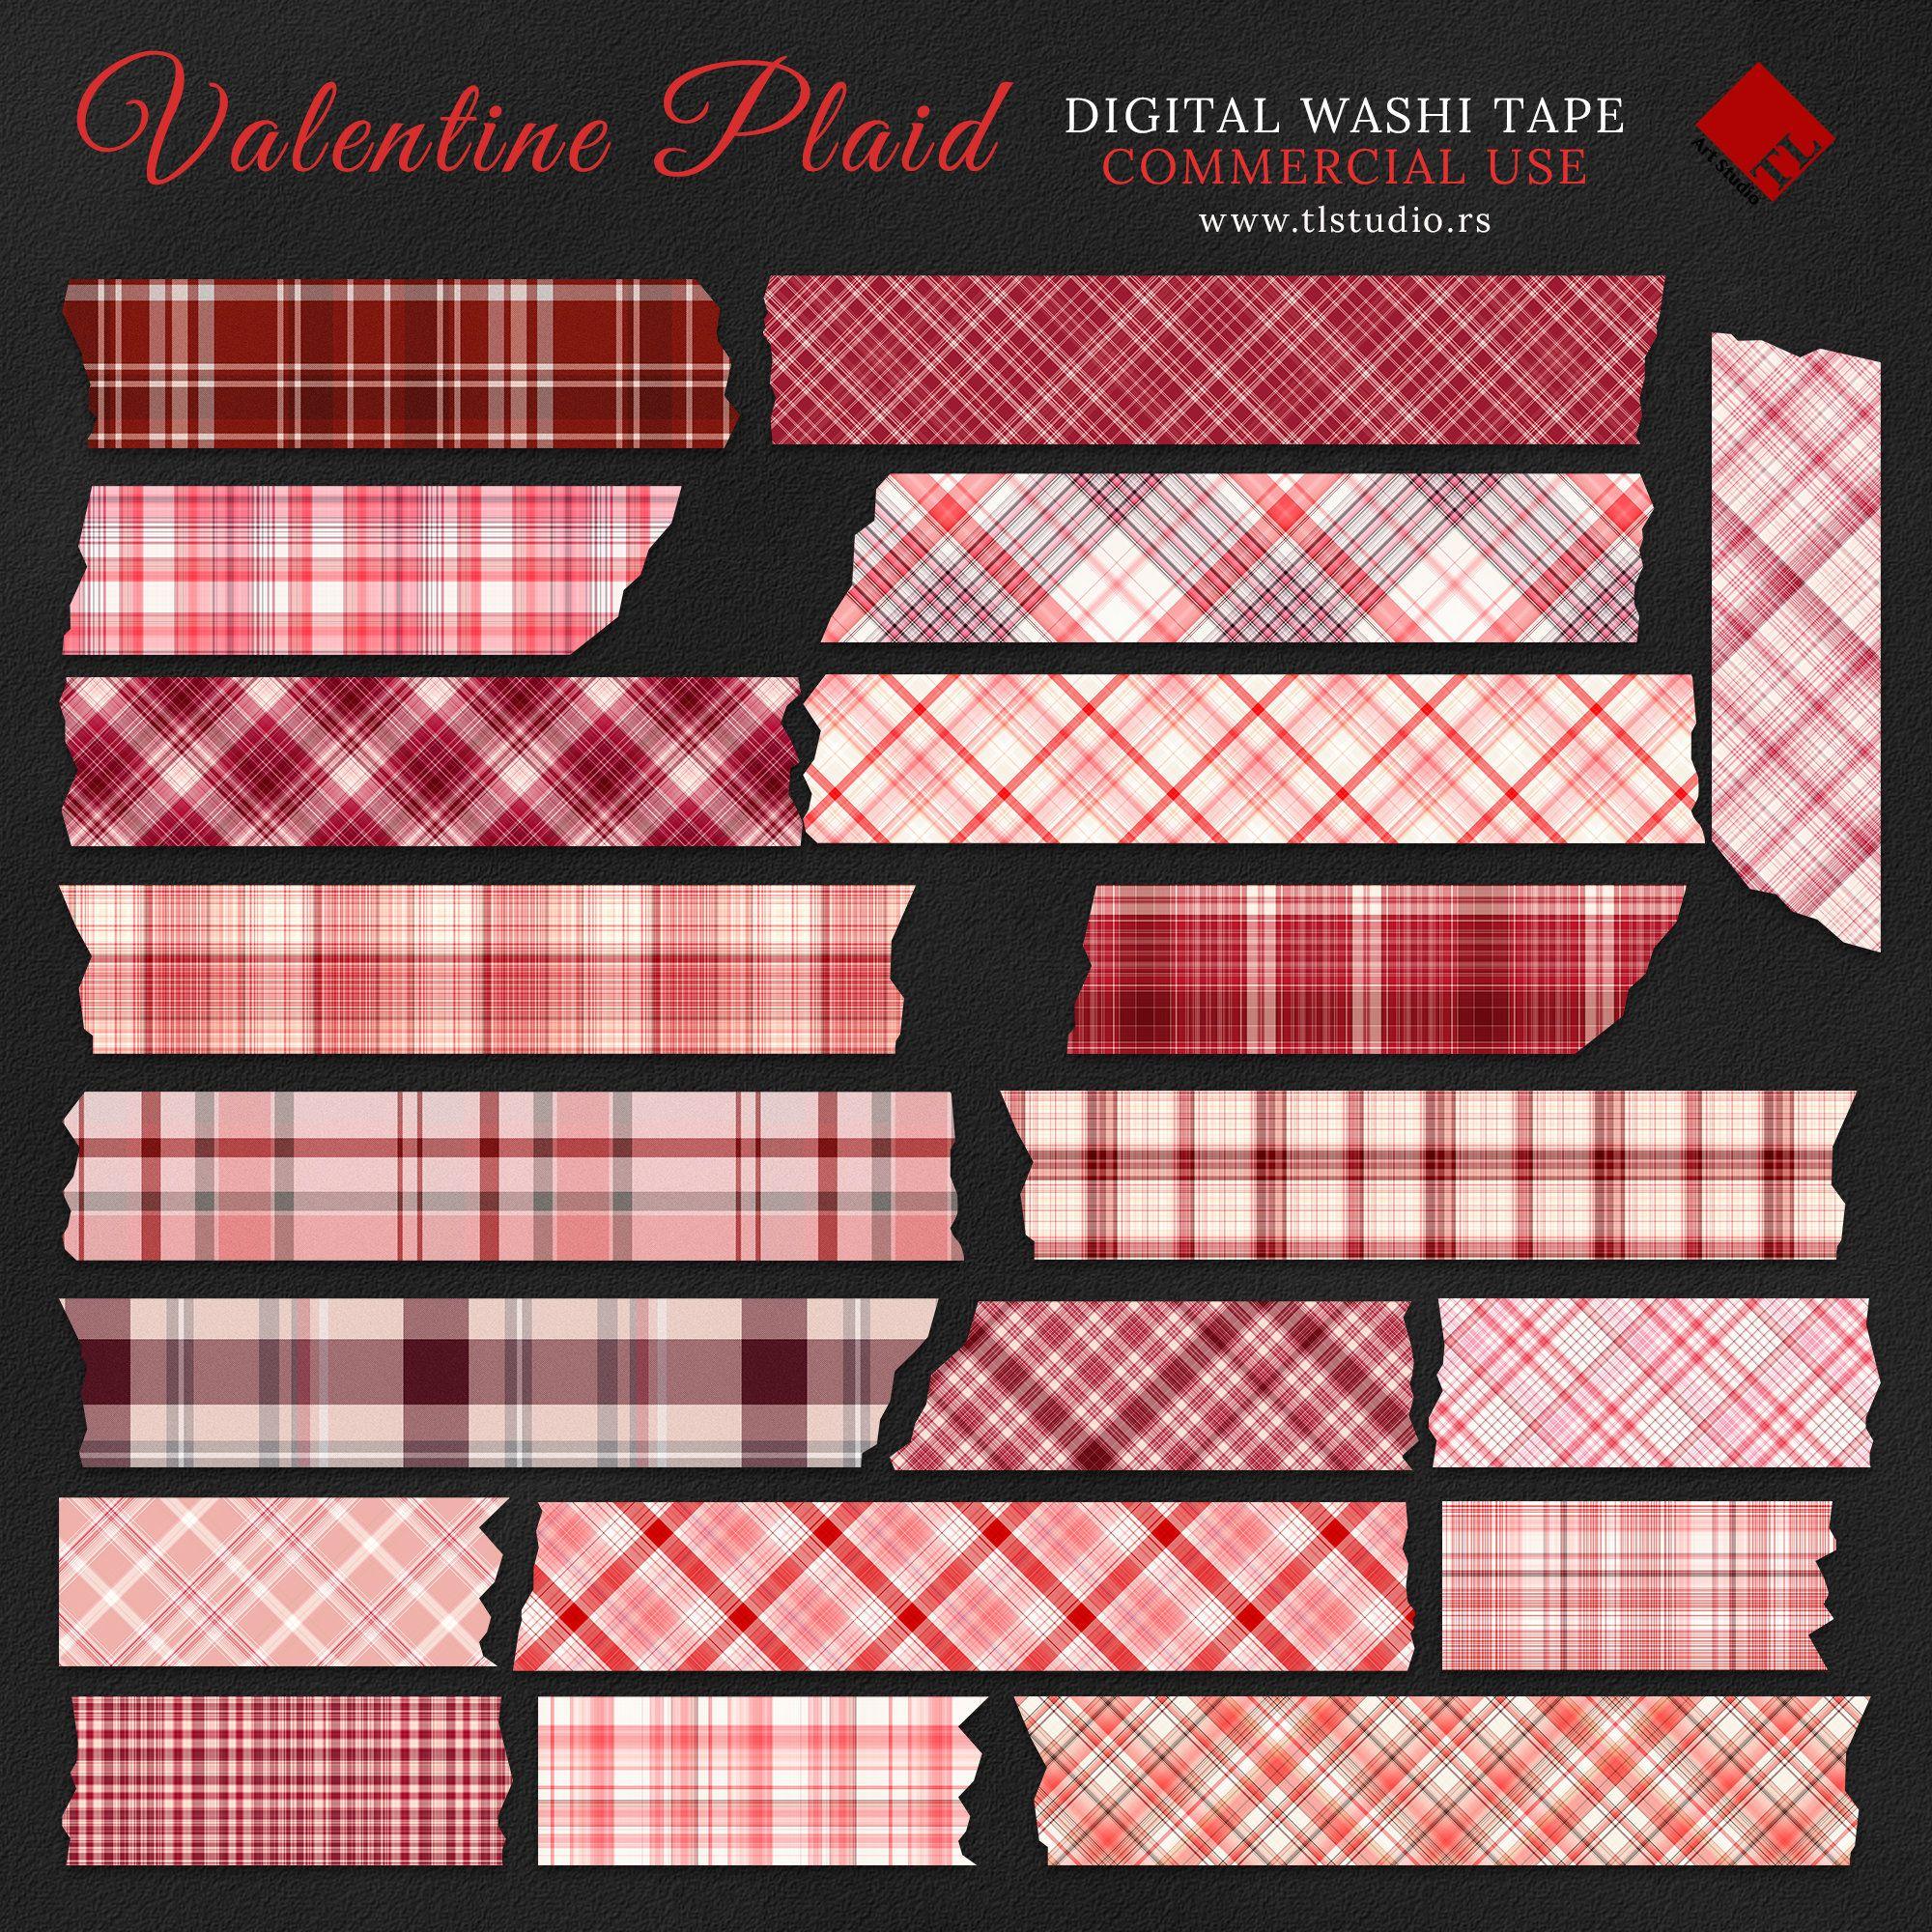 Valentine Plaid Digital Washi Tape Commercial Use Red Plaid Etsy In 2021 Washi Tape Washi Tape Planner Washi